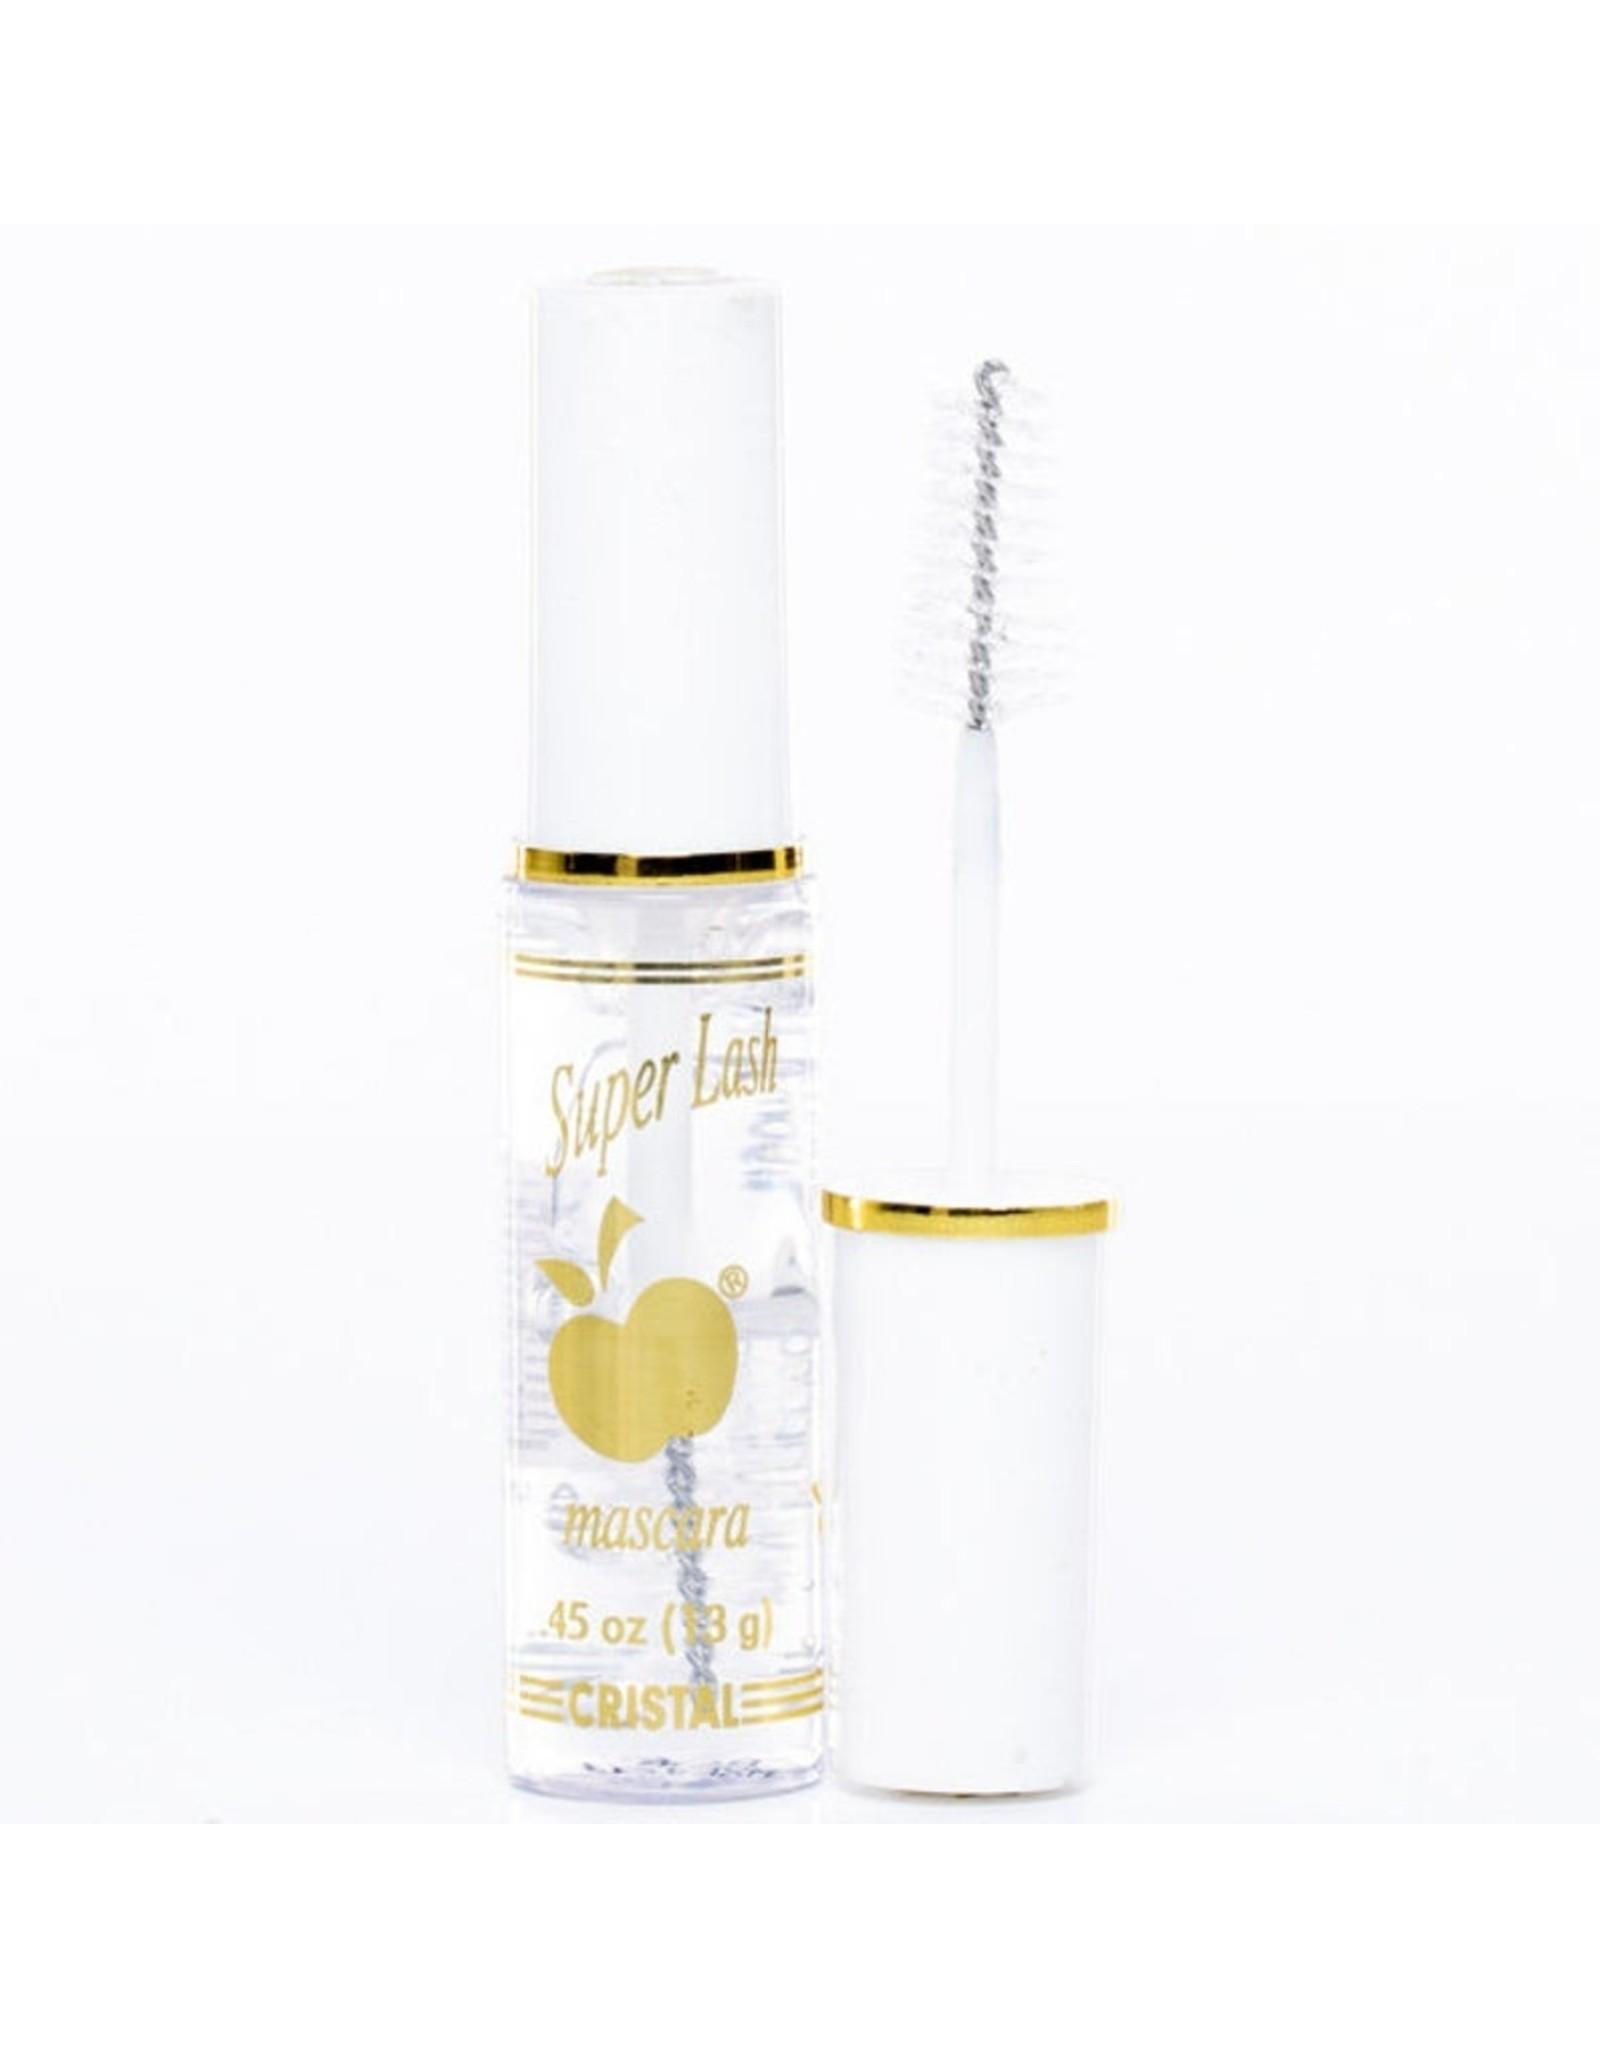 Apple Super Lash Mascara Crystal Clear